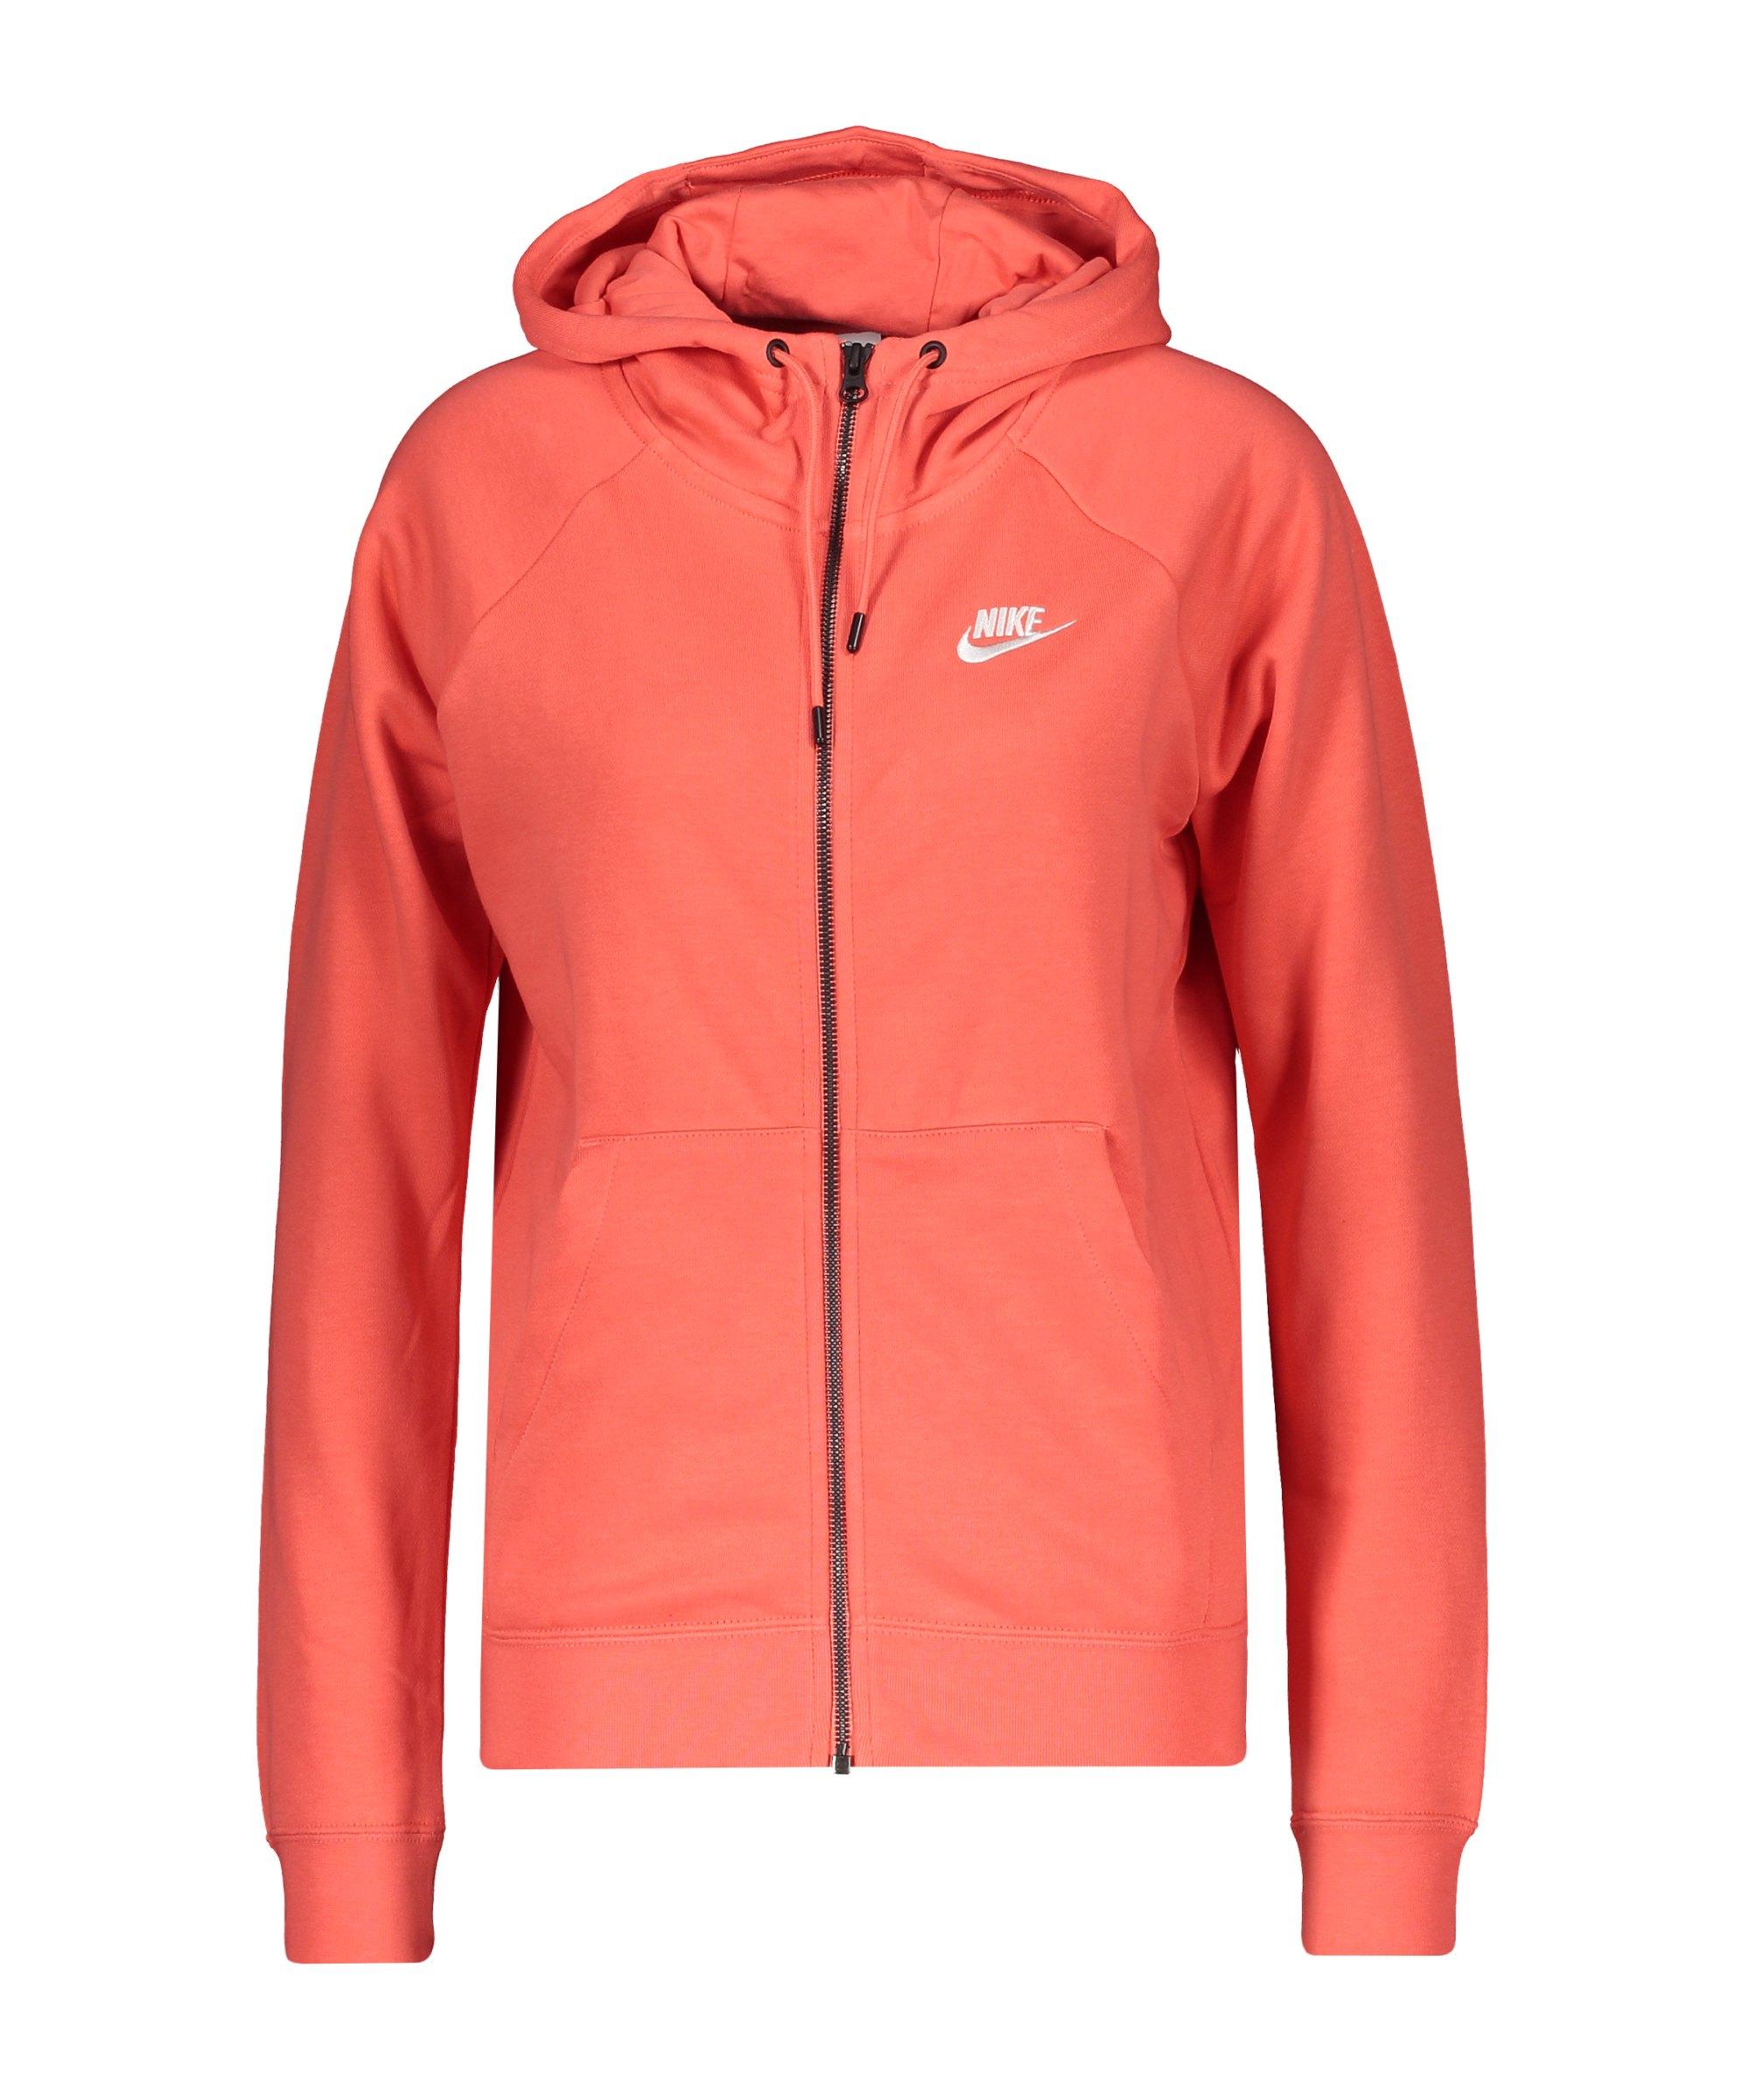 Nike Essential Fleece Kapuzenjacke DamenF815 - orange